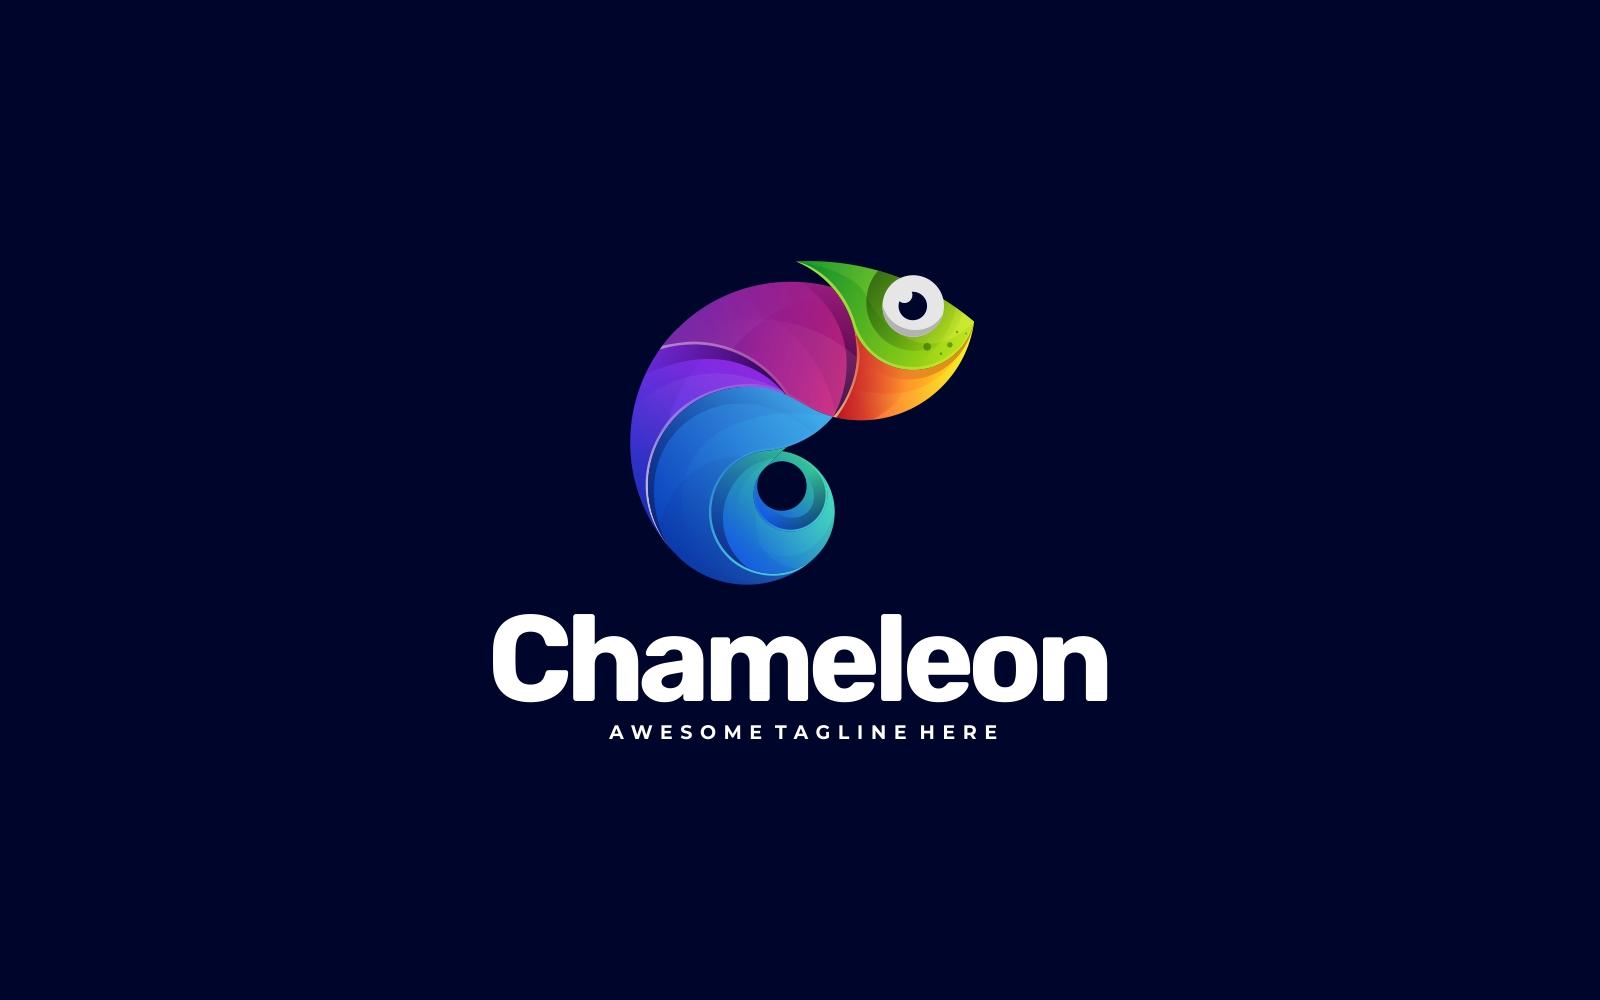 Creative Chameleon 3D Gradient Colorful Logo